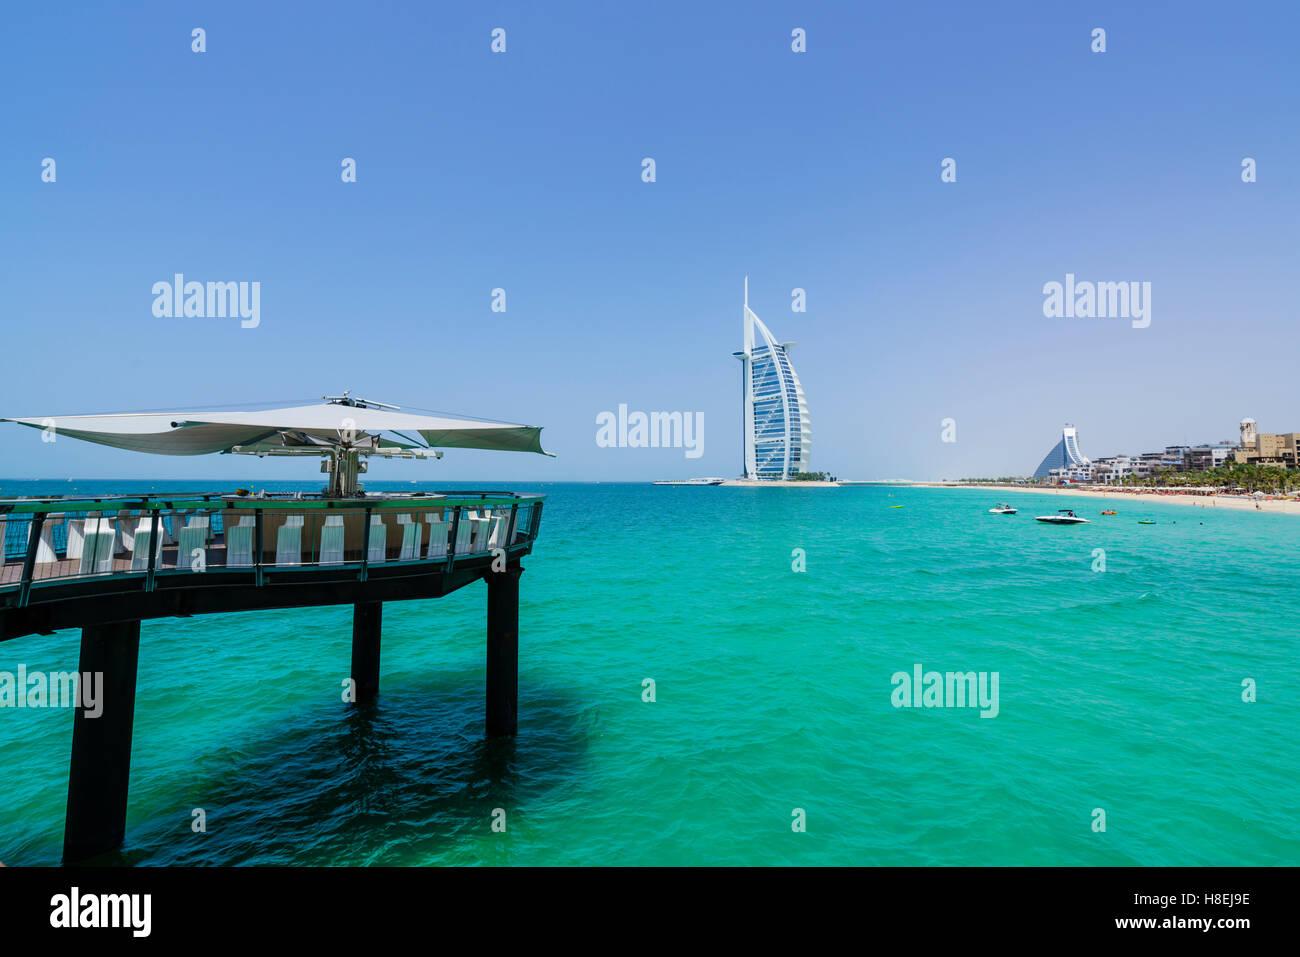 Burj Al Arab, Jumeirah Beach, Dubai, United Arab Emirates, Middle East - Stock Image